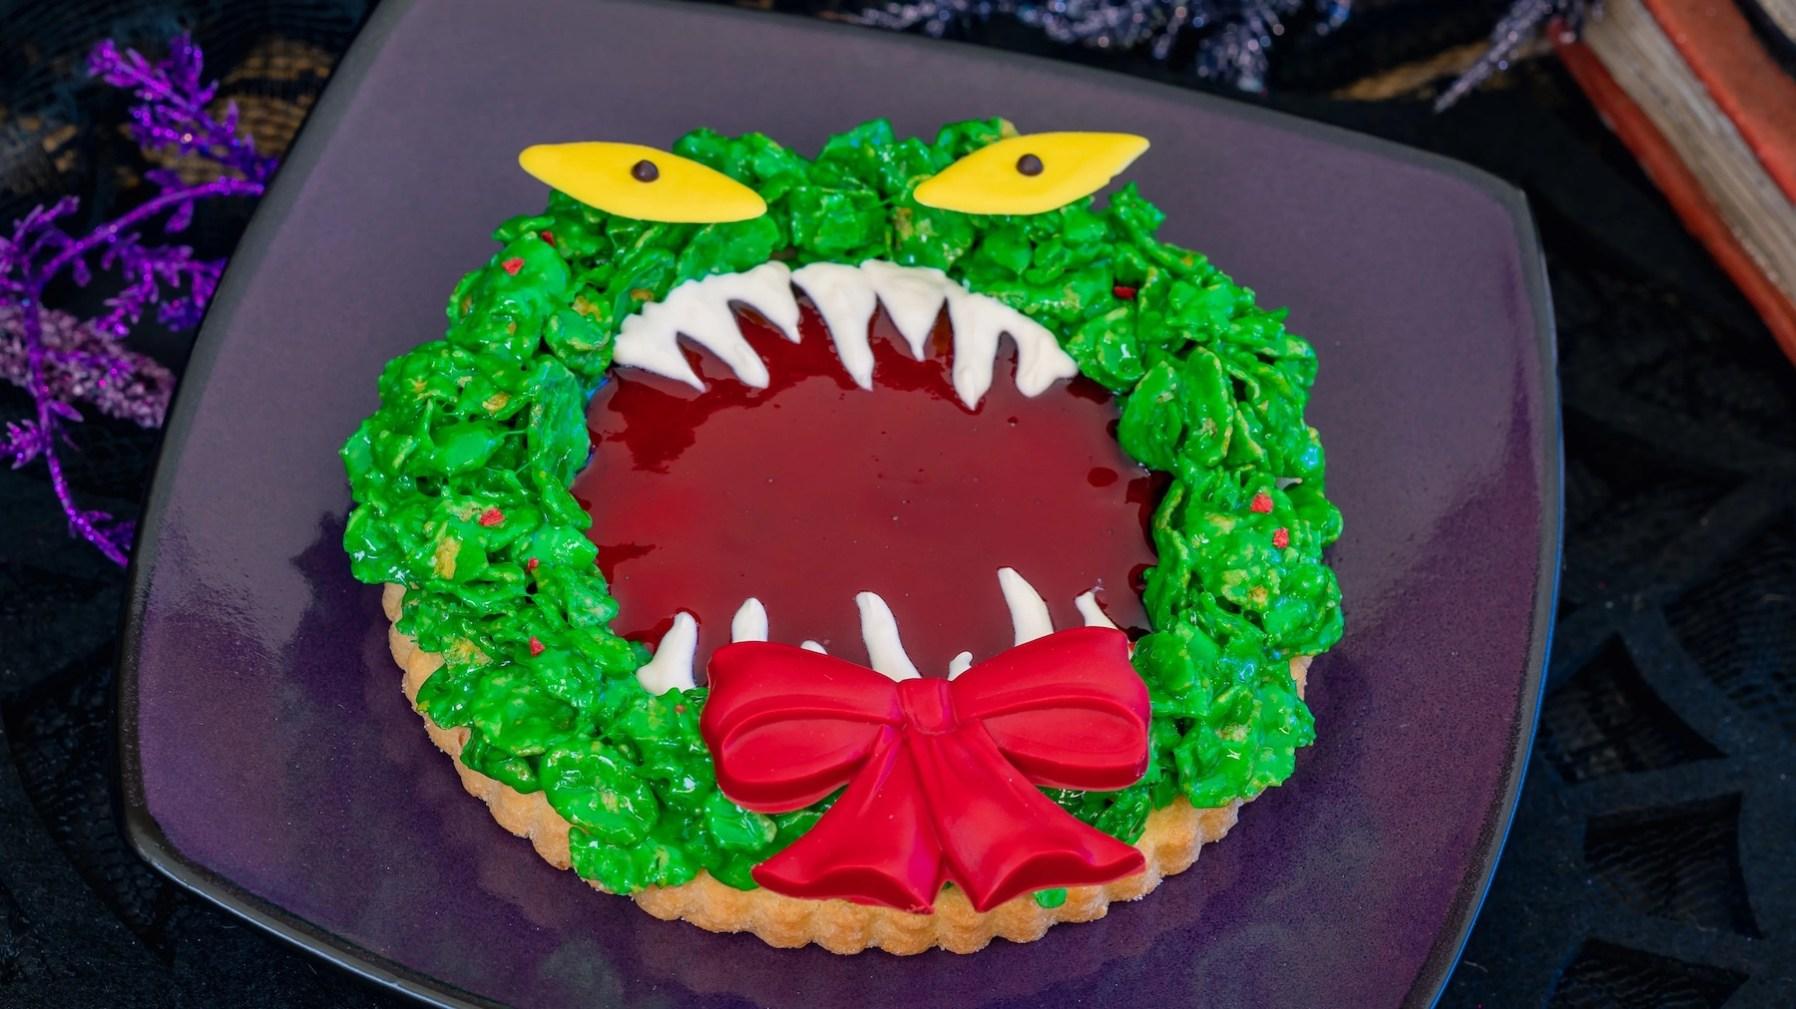 Haunted Mansion Holiday Wreath Cookie (French Market). (David Nguyen/Disneyland Resort)